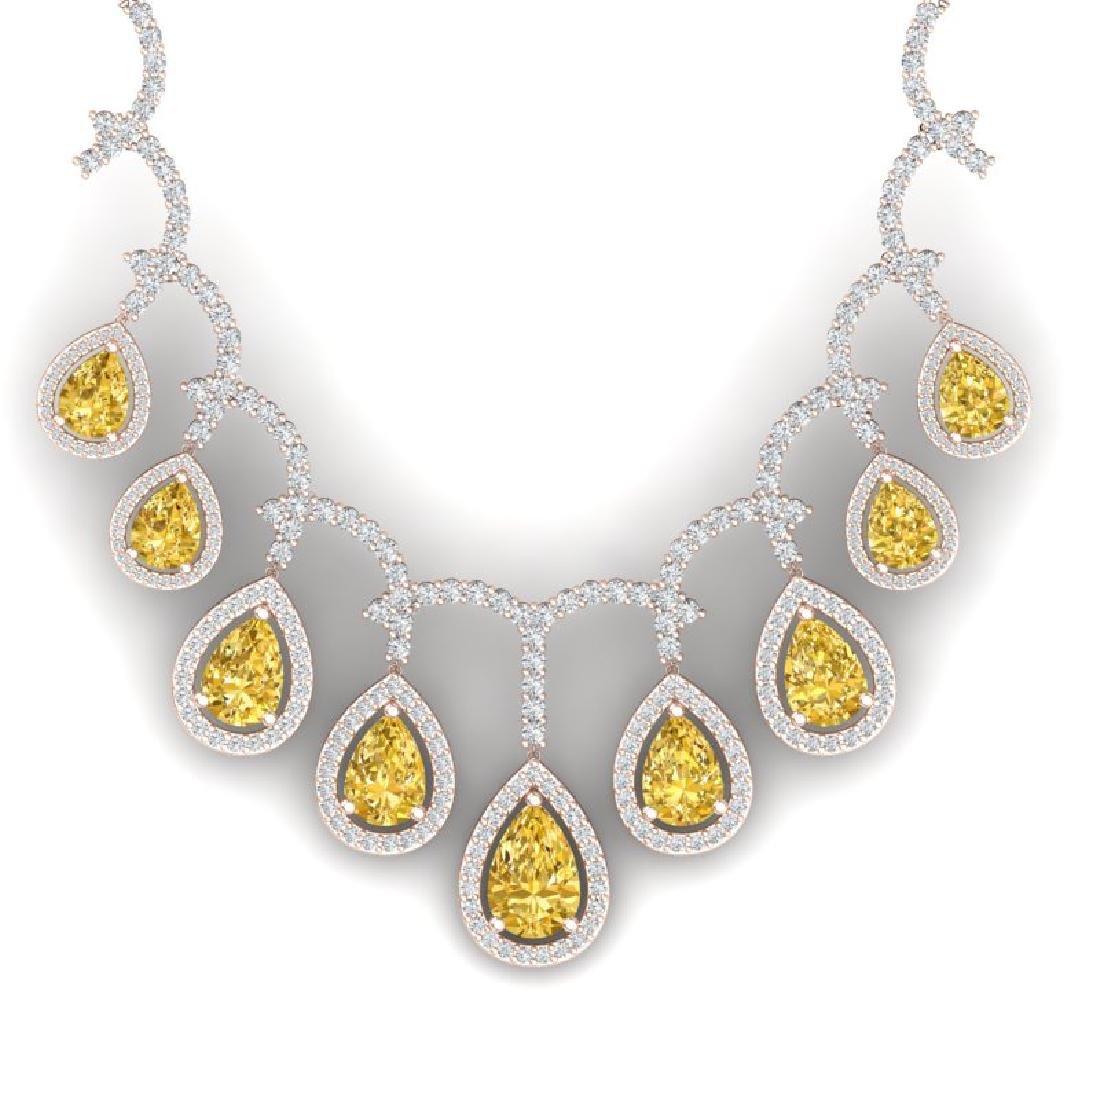 29.42 CTW Royalty Canary Citrine & VS Diamond Necklace